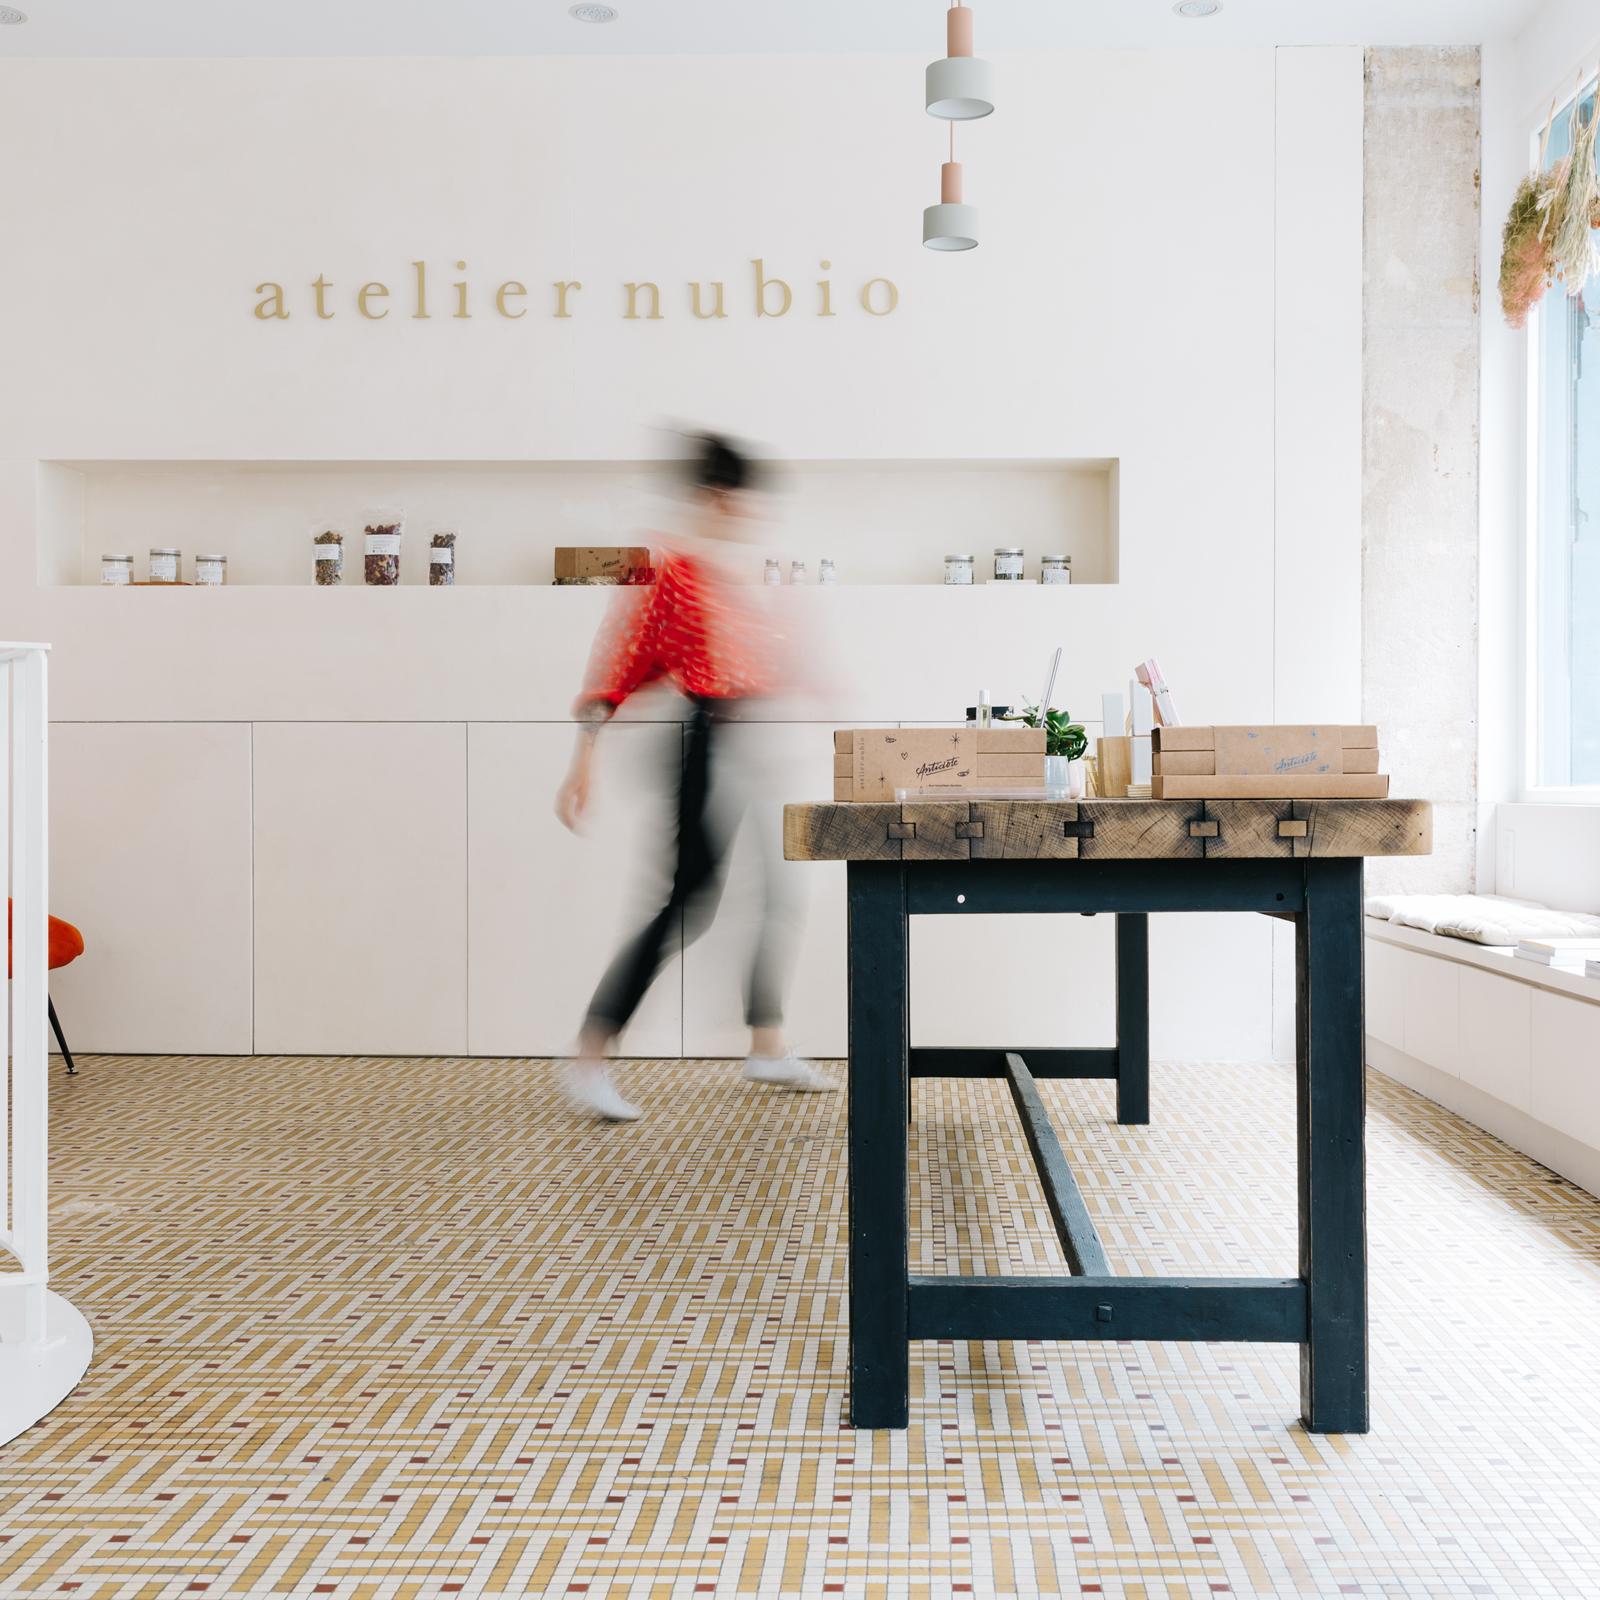 nubio_anne-charlotte-moreau_set-design01